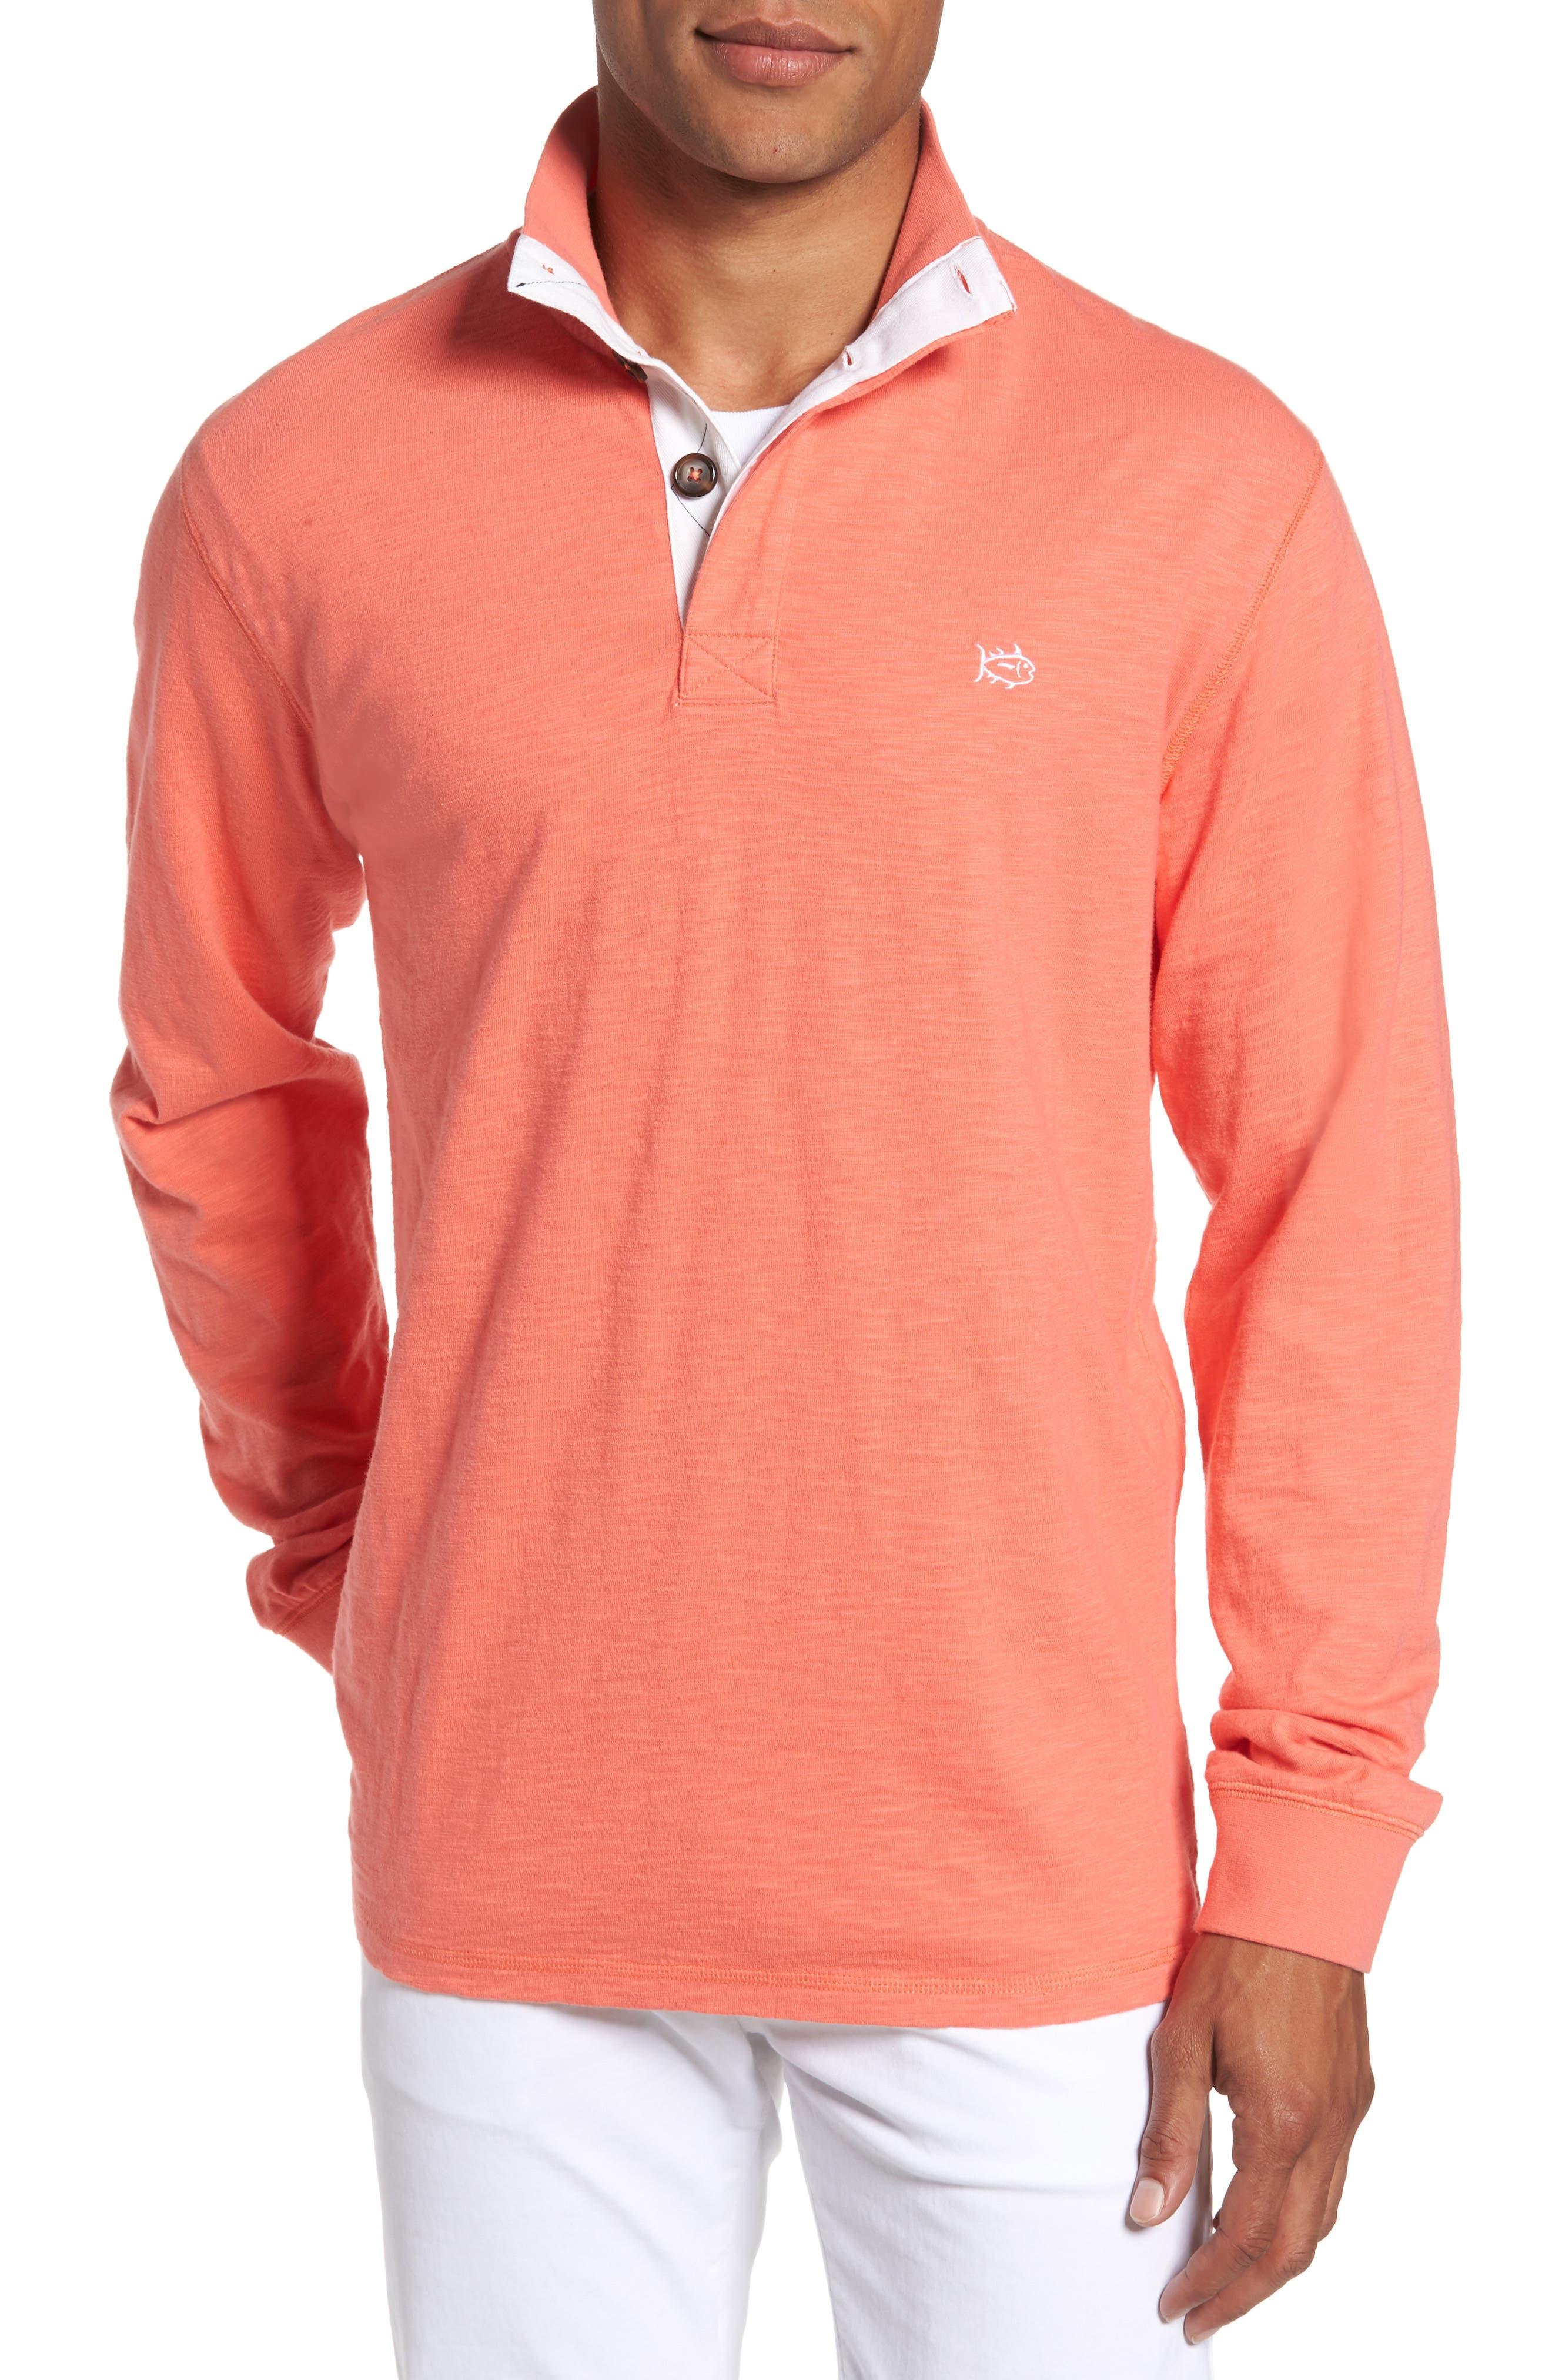 Gulf Stream Sweatshirt,                             Main thumbnail 1, color,                             Melon